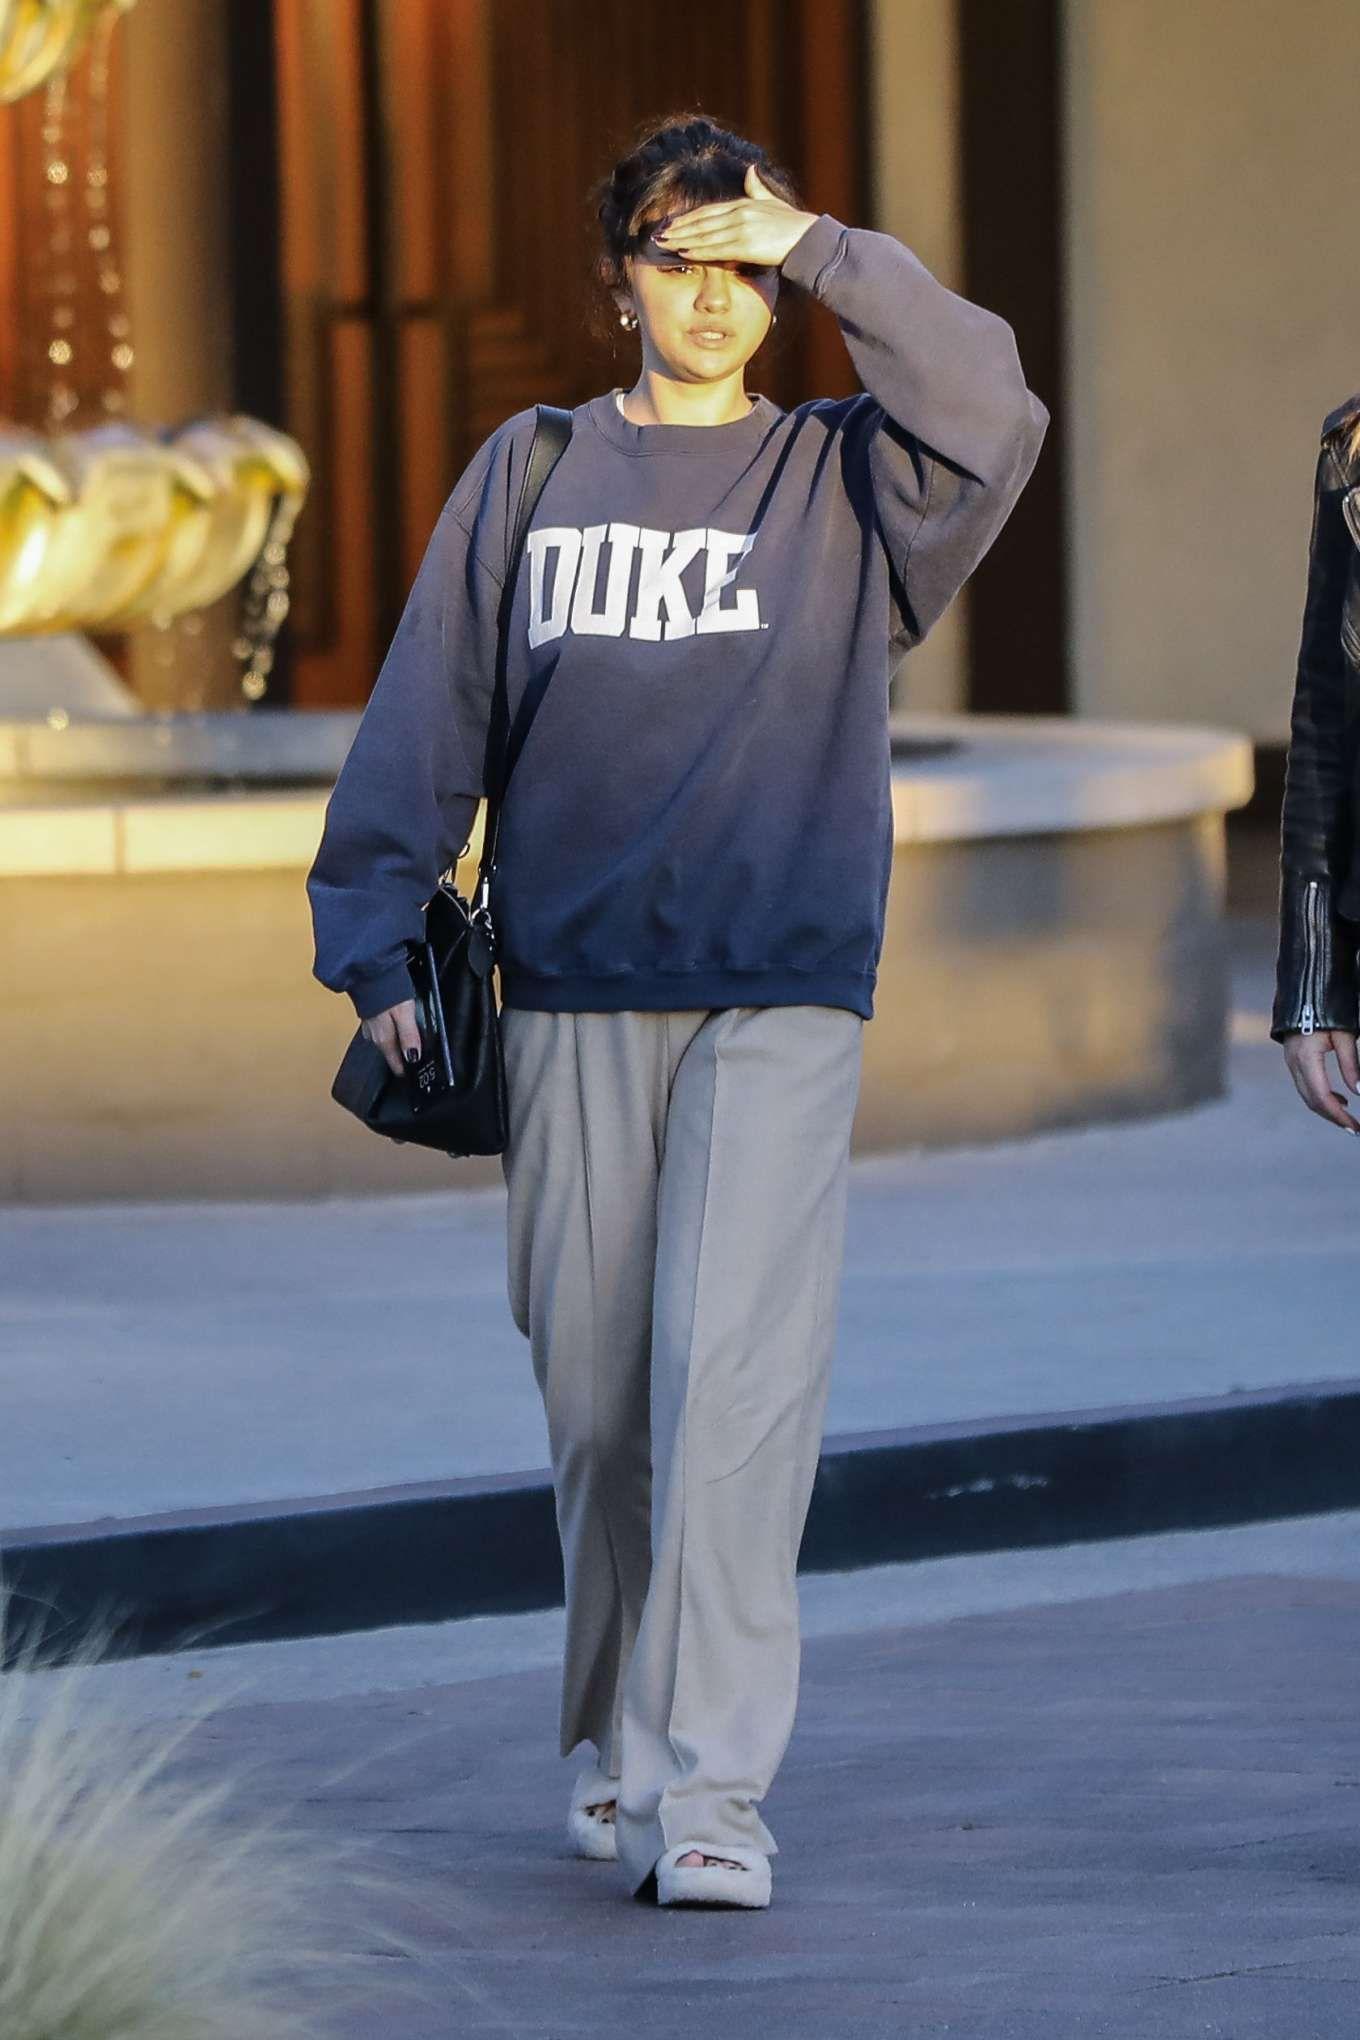 Predownload: Duke Sweatshirt Graphic Tees For Women Unisex Crewneck Sweatshirt Spreadshirt Oversized Tee Outfit Retro Outfits Fashion Inspo Outfits [ 2040 x 1360 Pixel ]